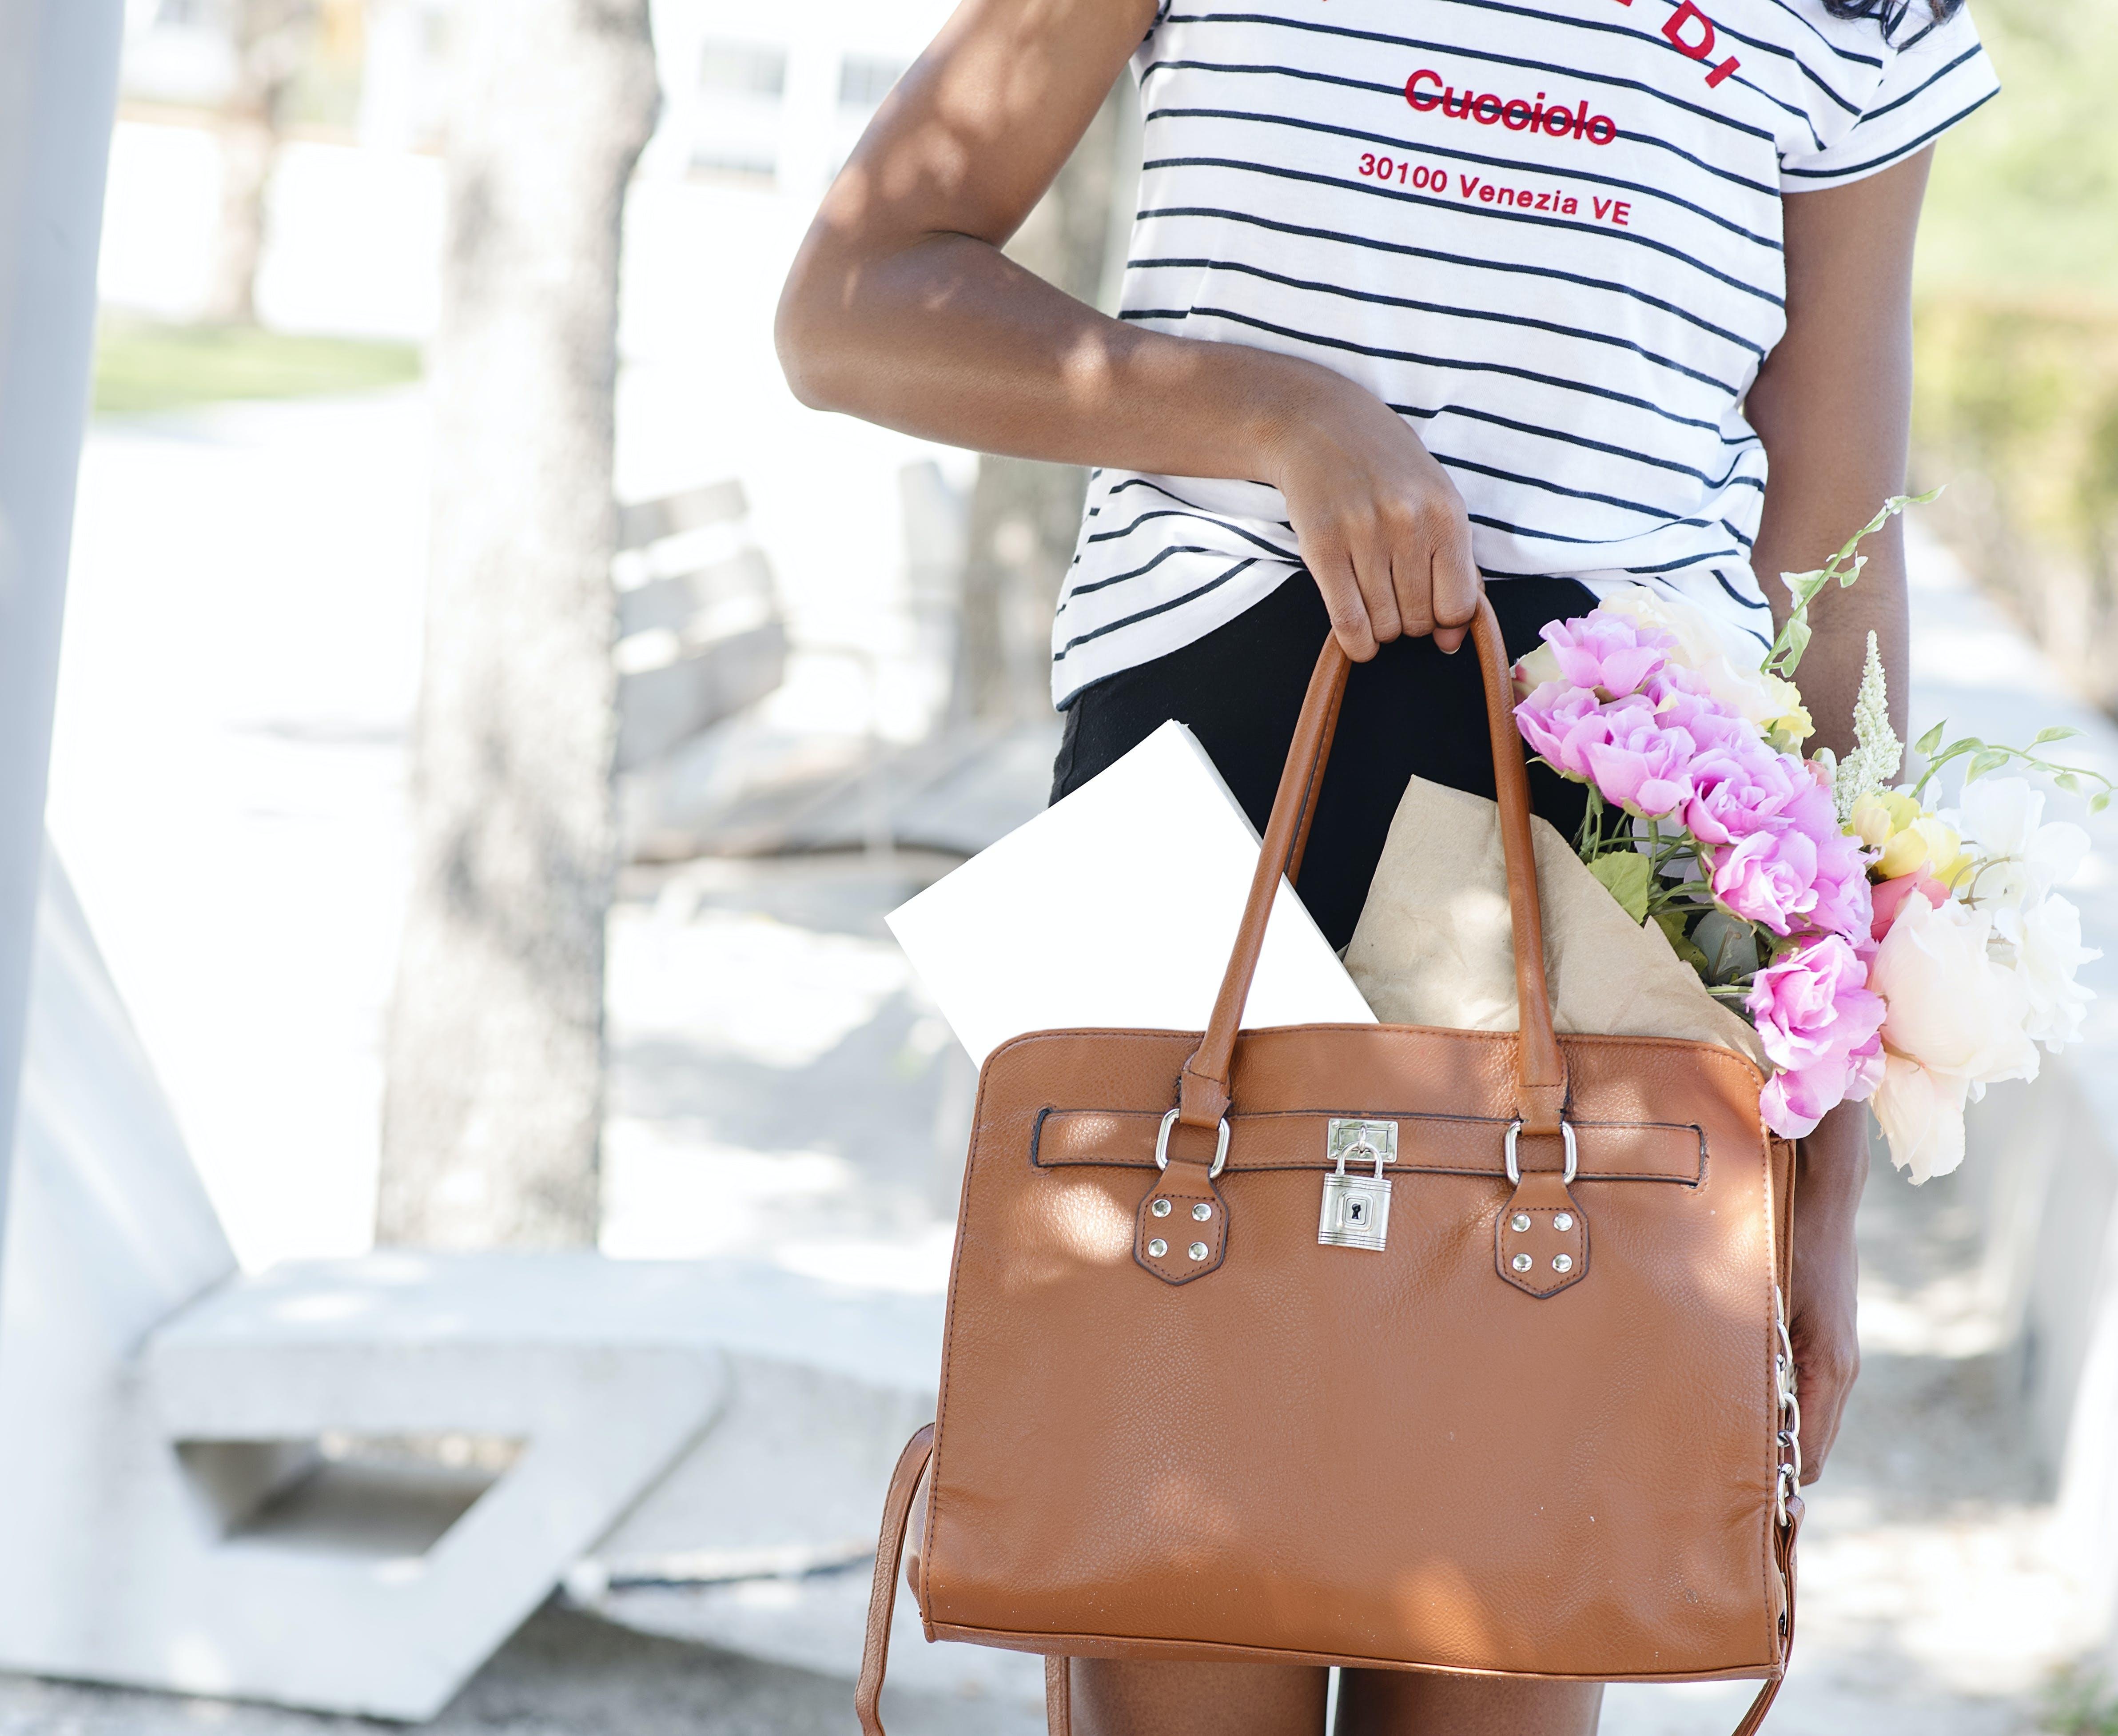 Person Holding Two-way Handbag